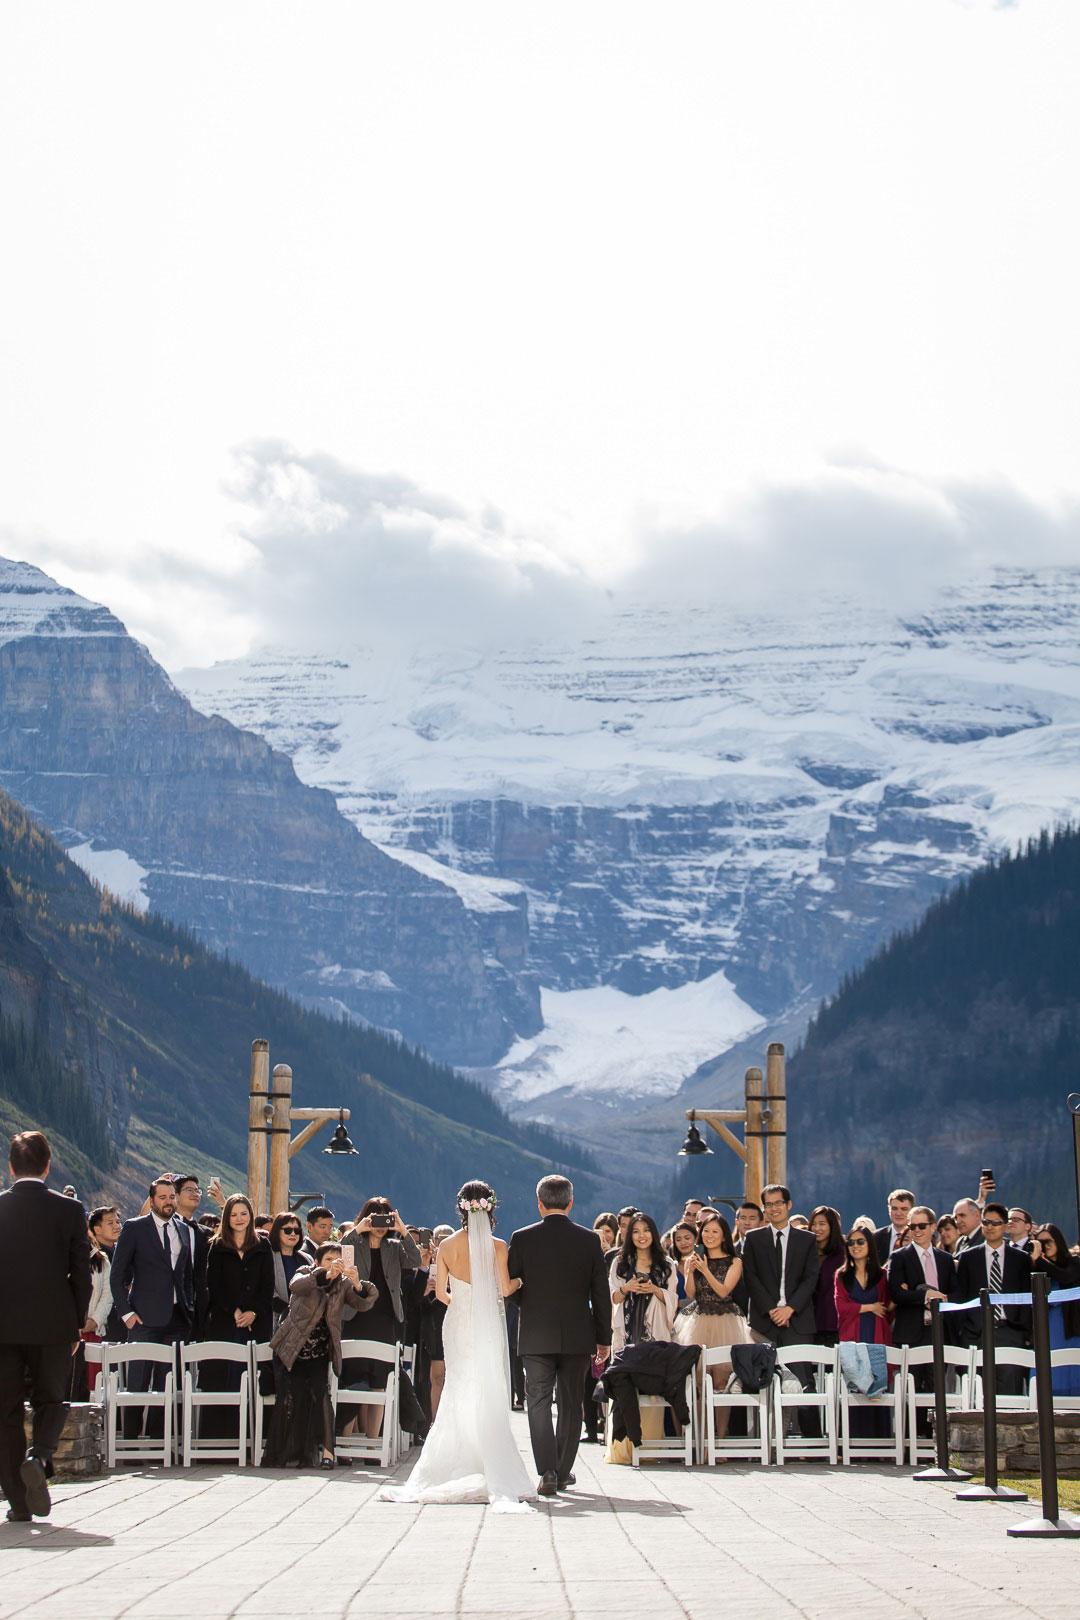 A Mountain Wedding at Chateau Lake Louise, Canada